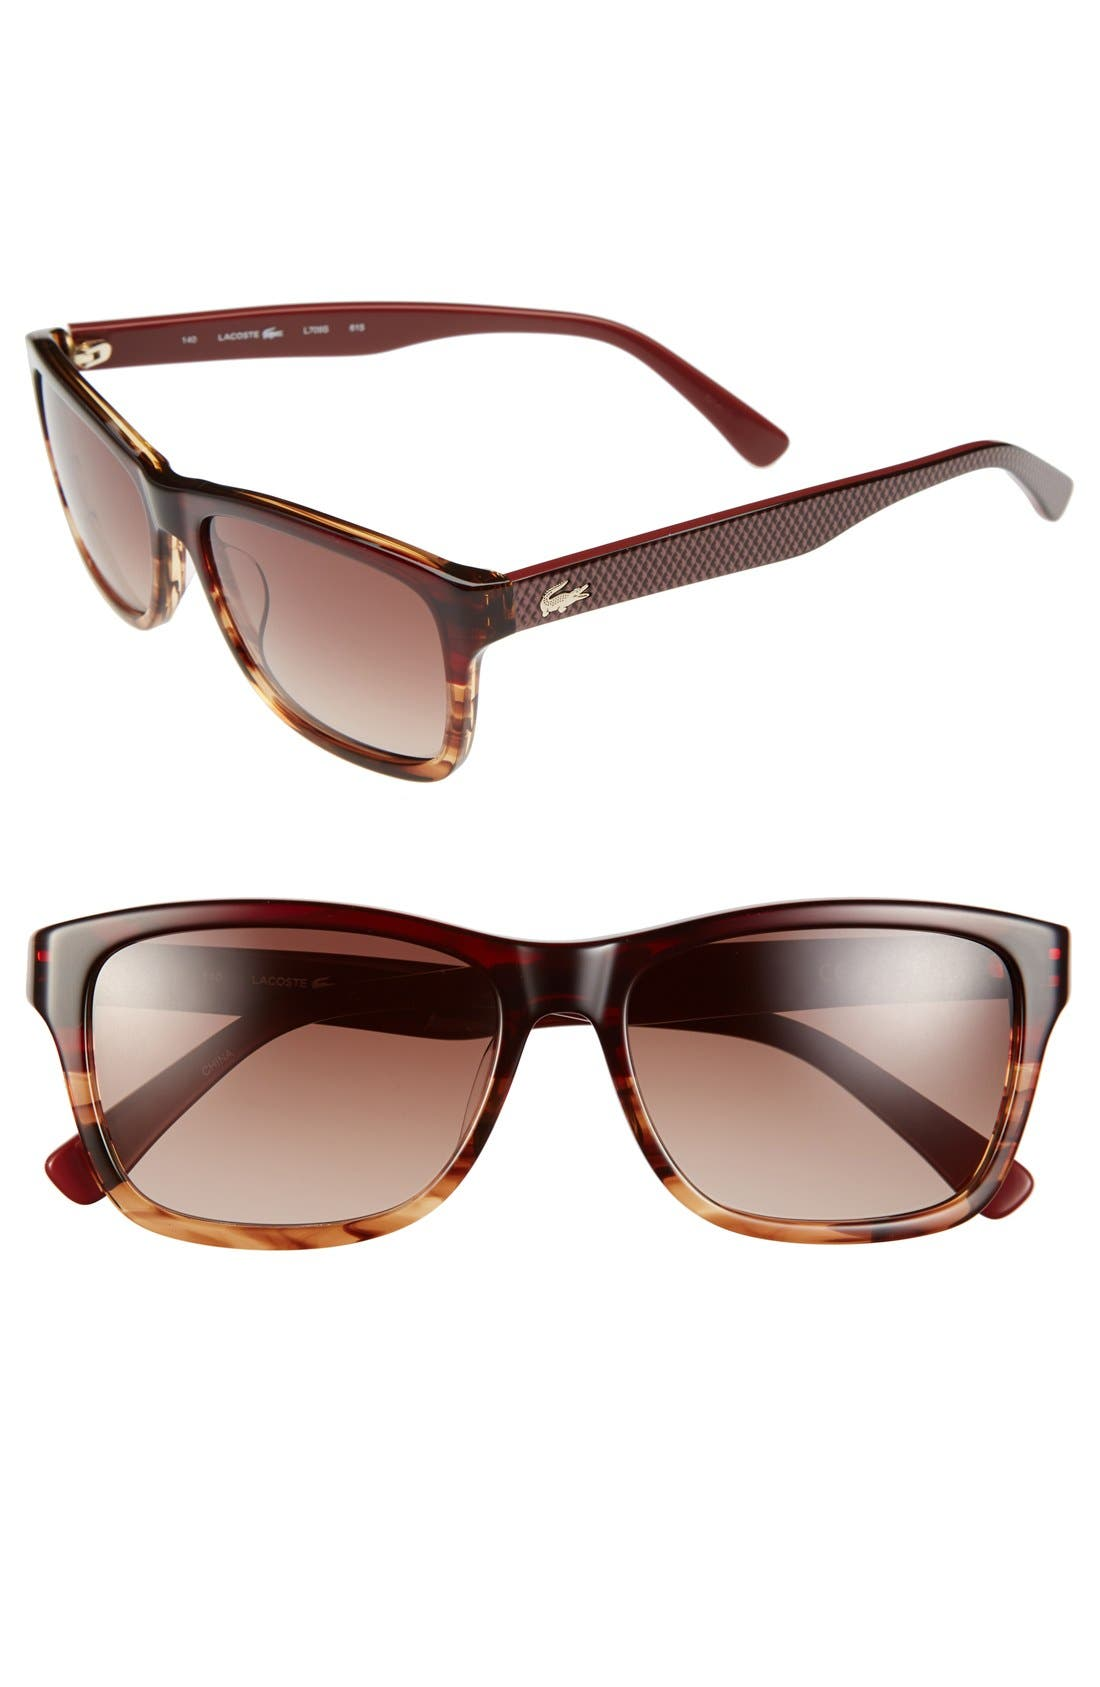 Main Image - Lacoste 55mm Rectangular Sunglasses